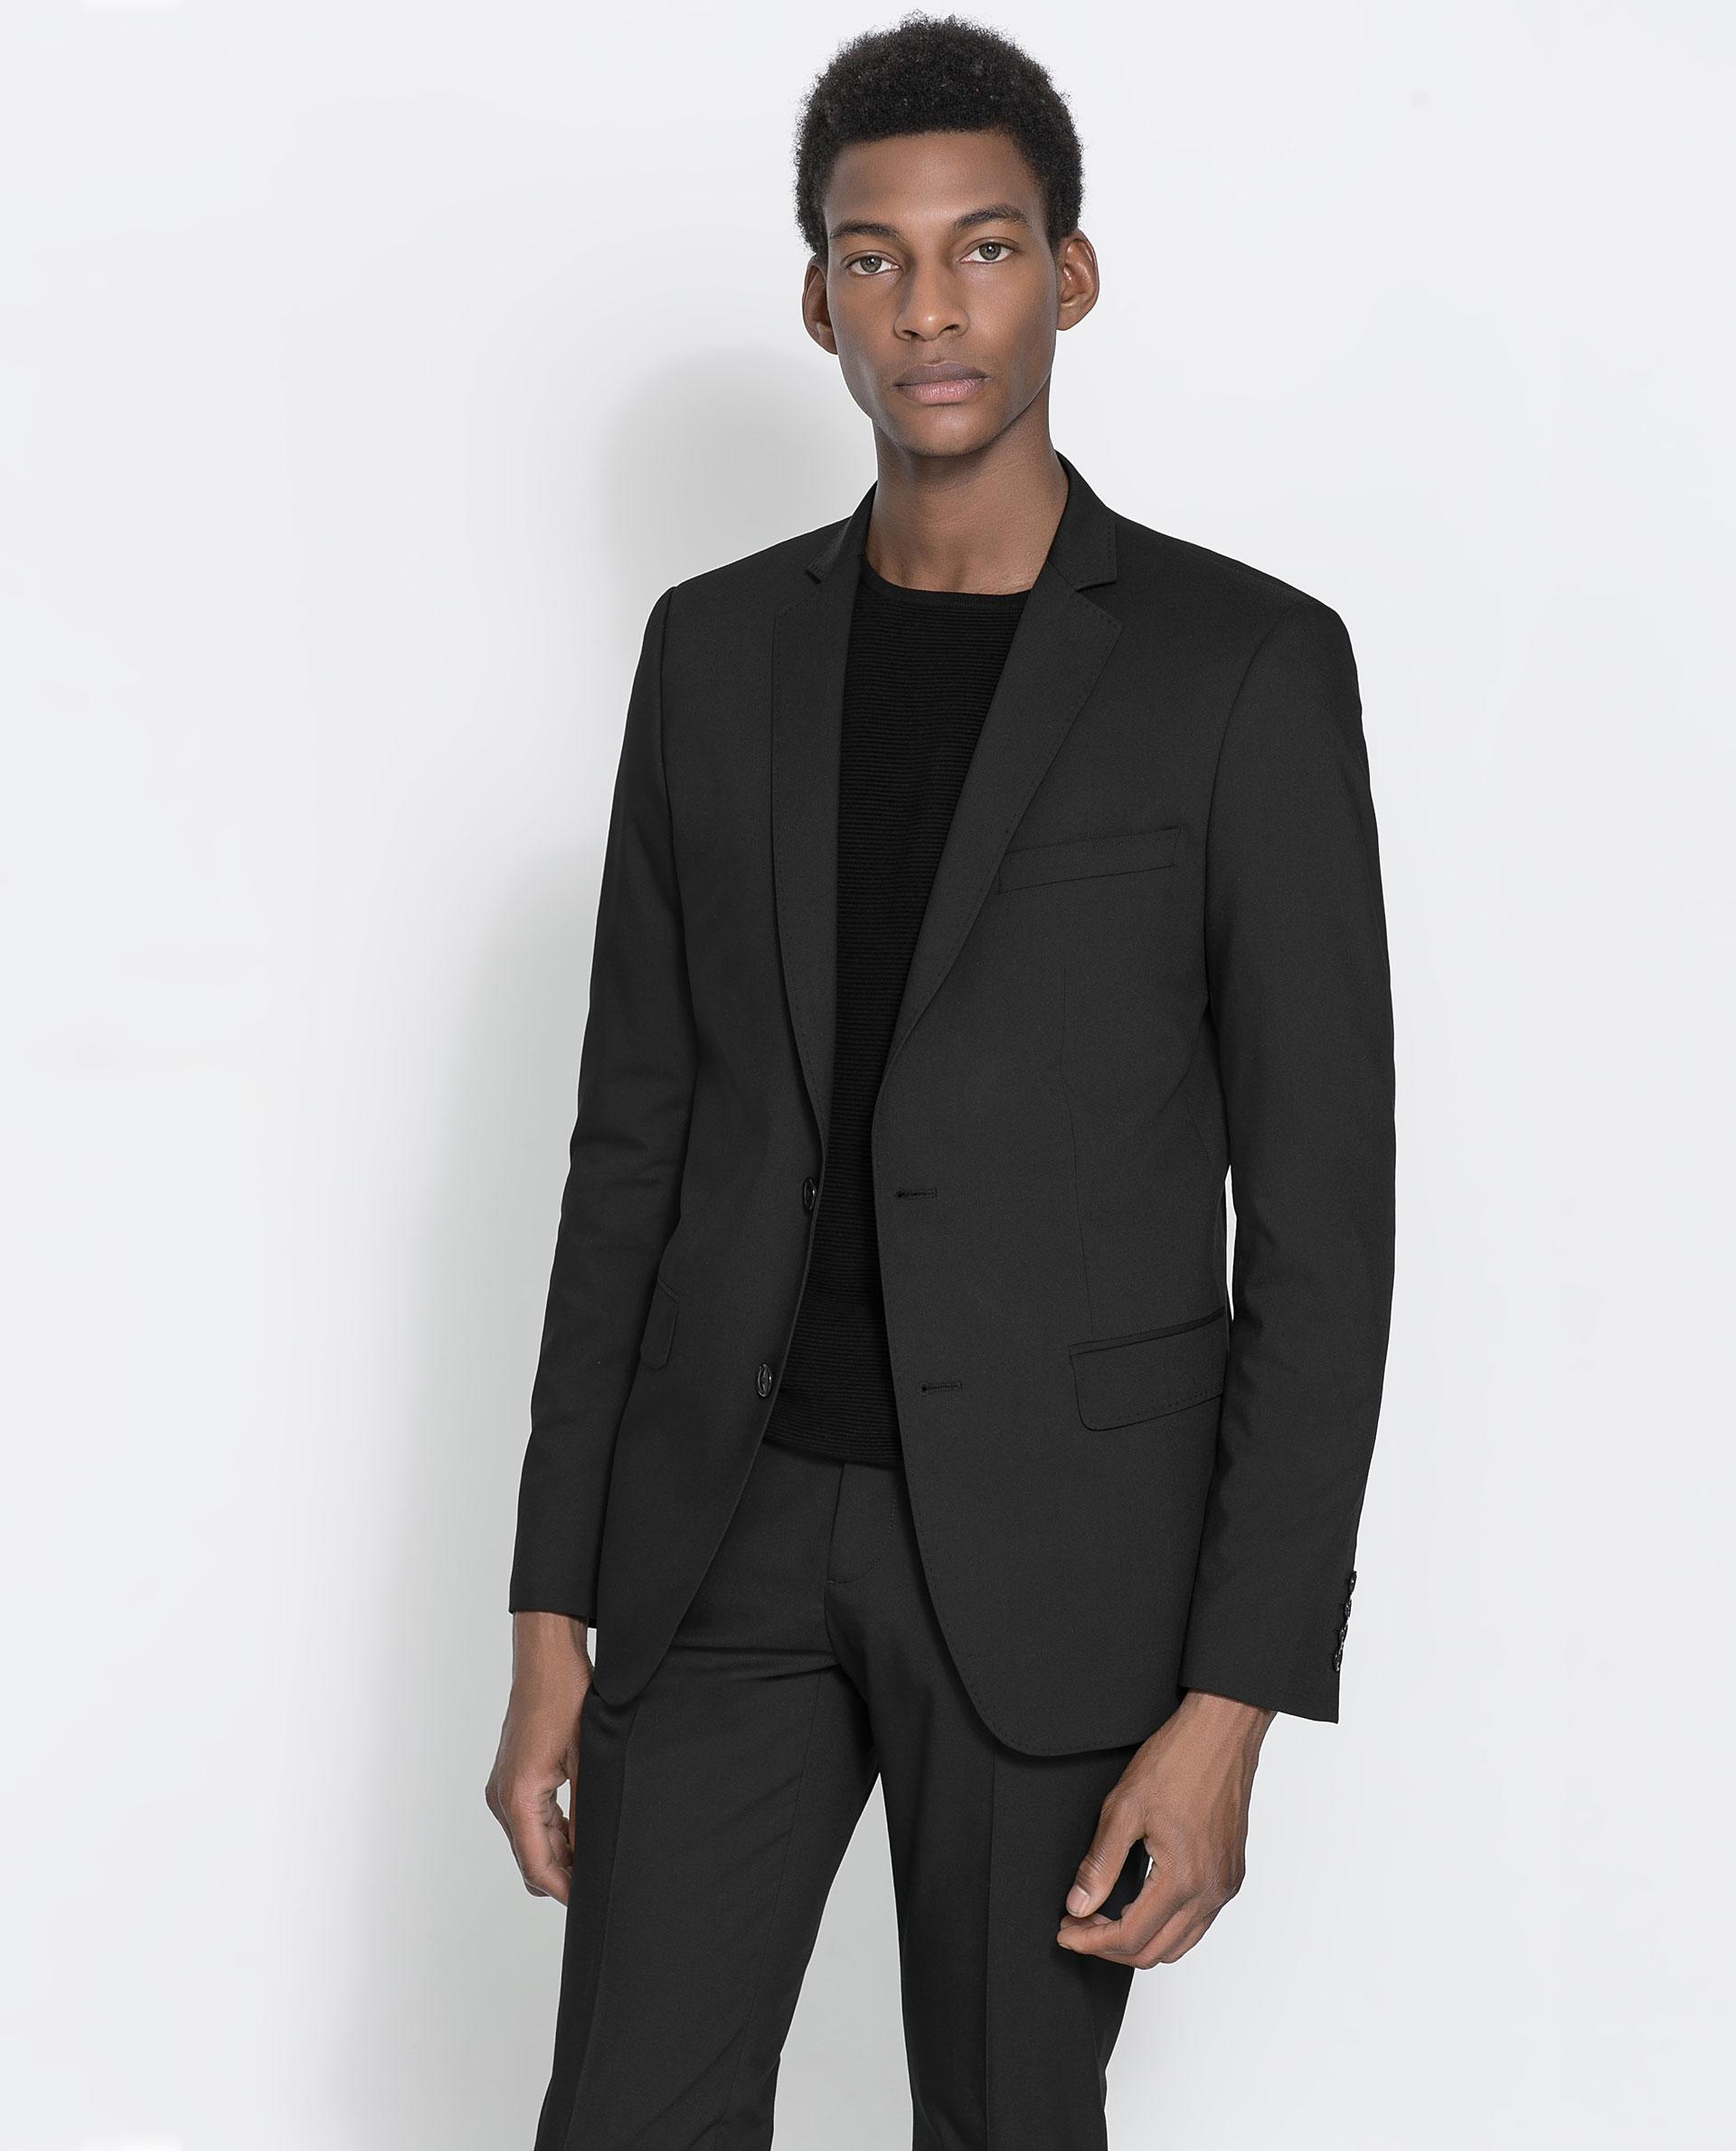 blazer noir homme nike air max 2011 cuir. Black Bedroom Furniture Sets. Home Design Ideas